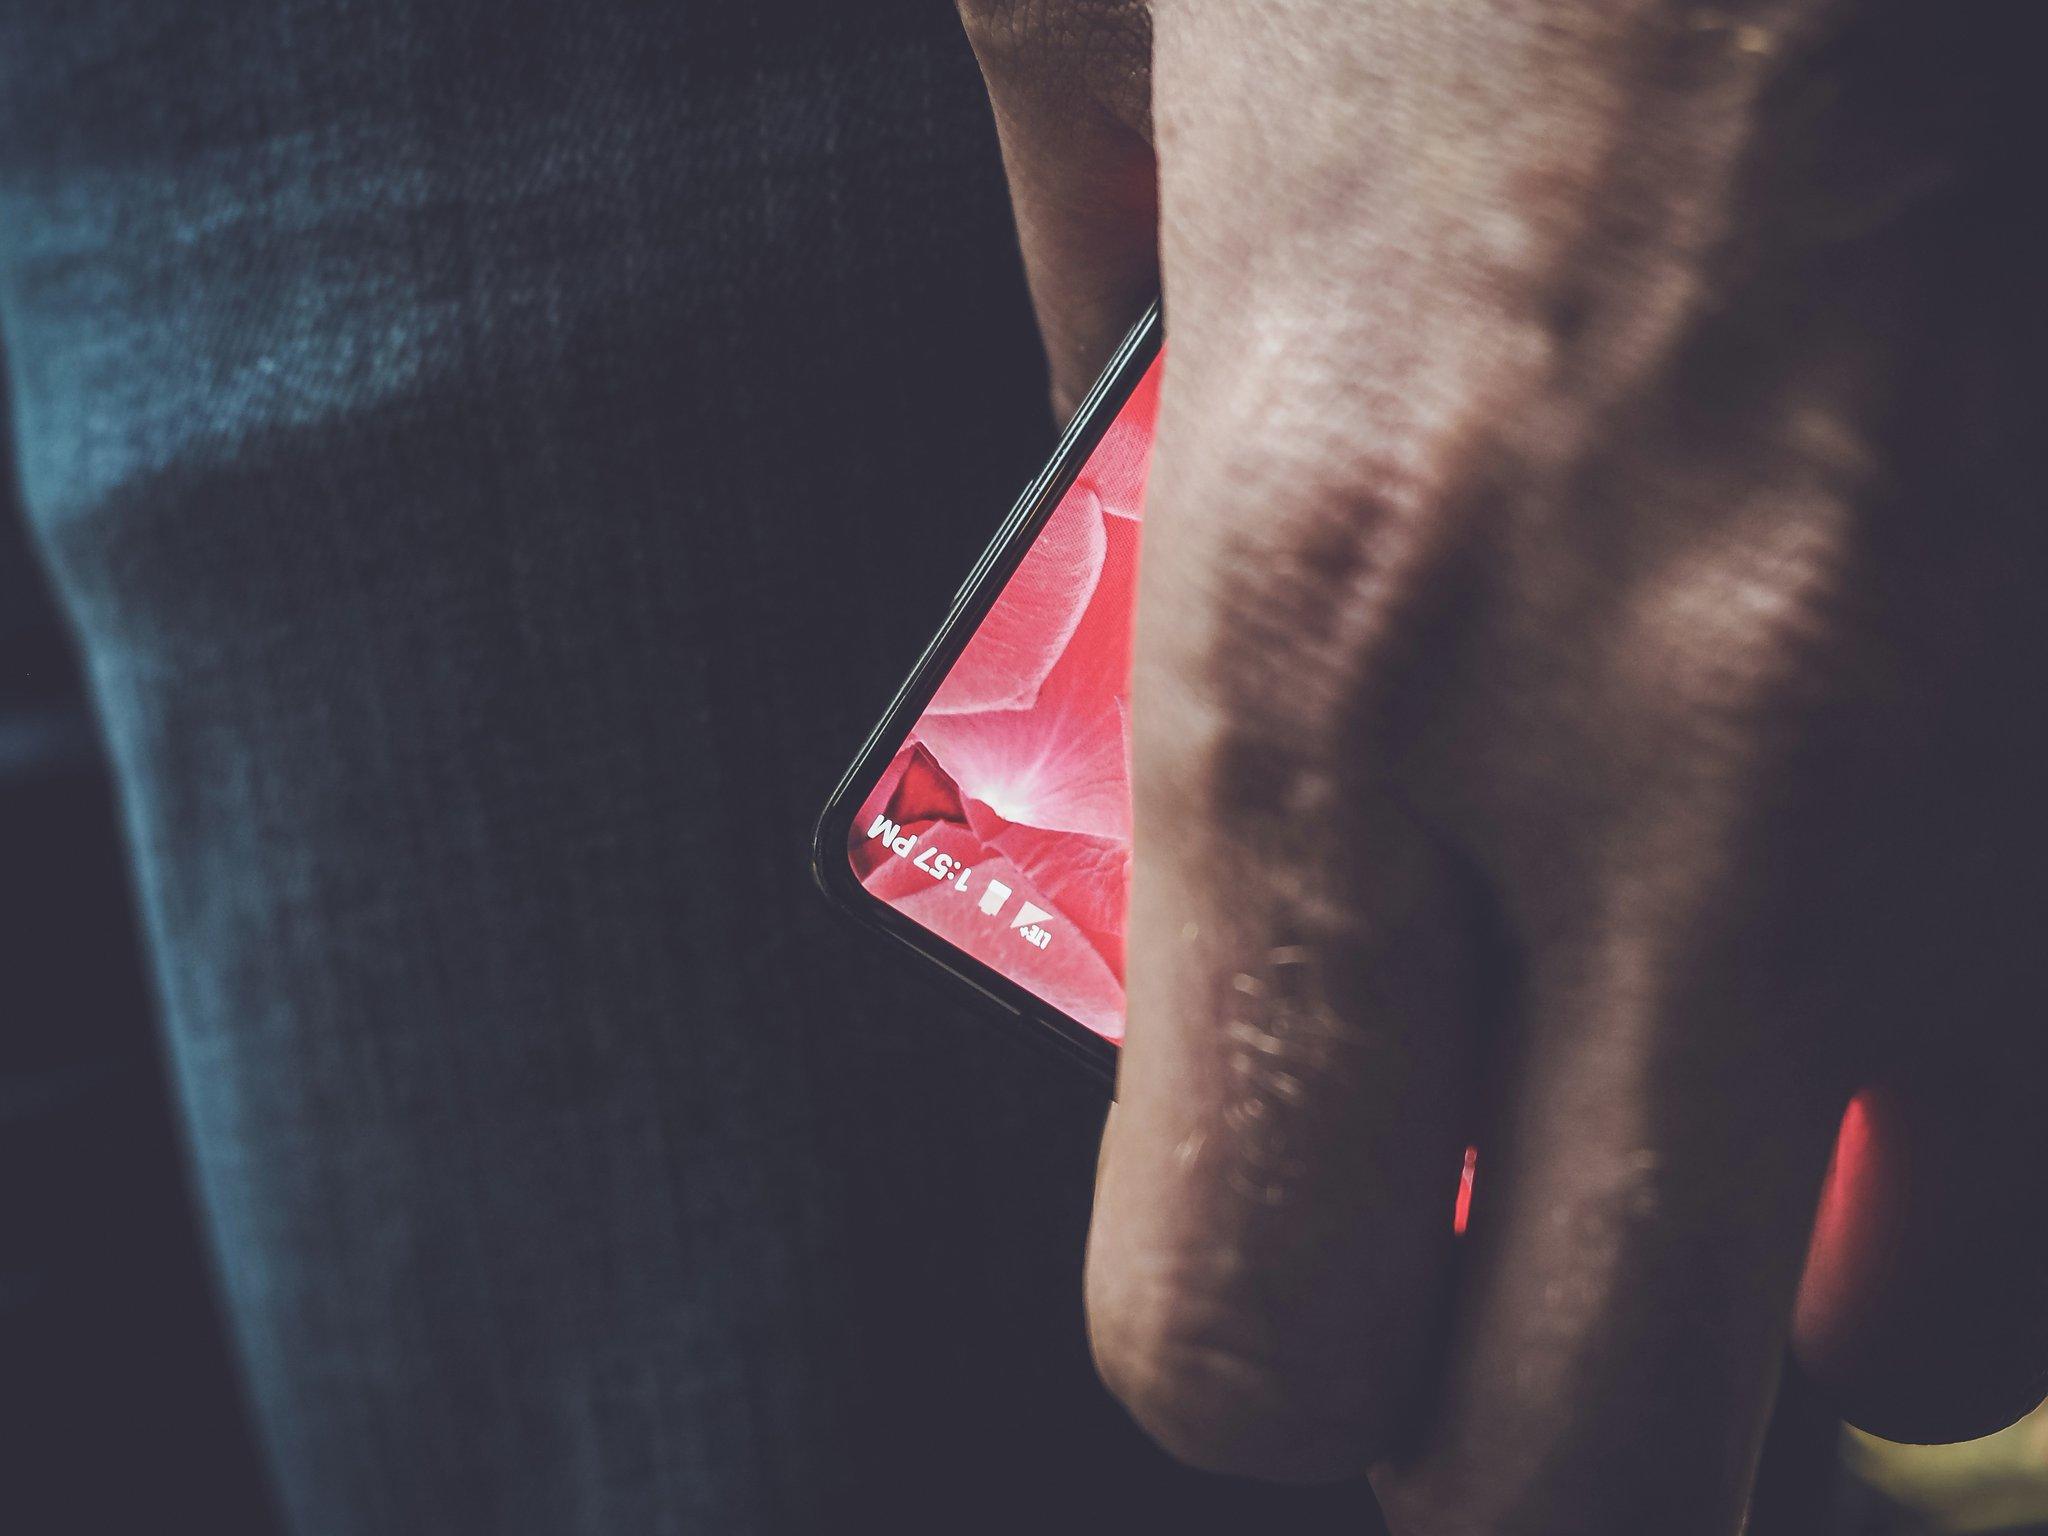 Essential Modular Phone